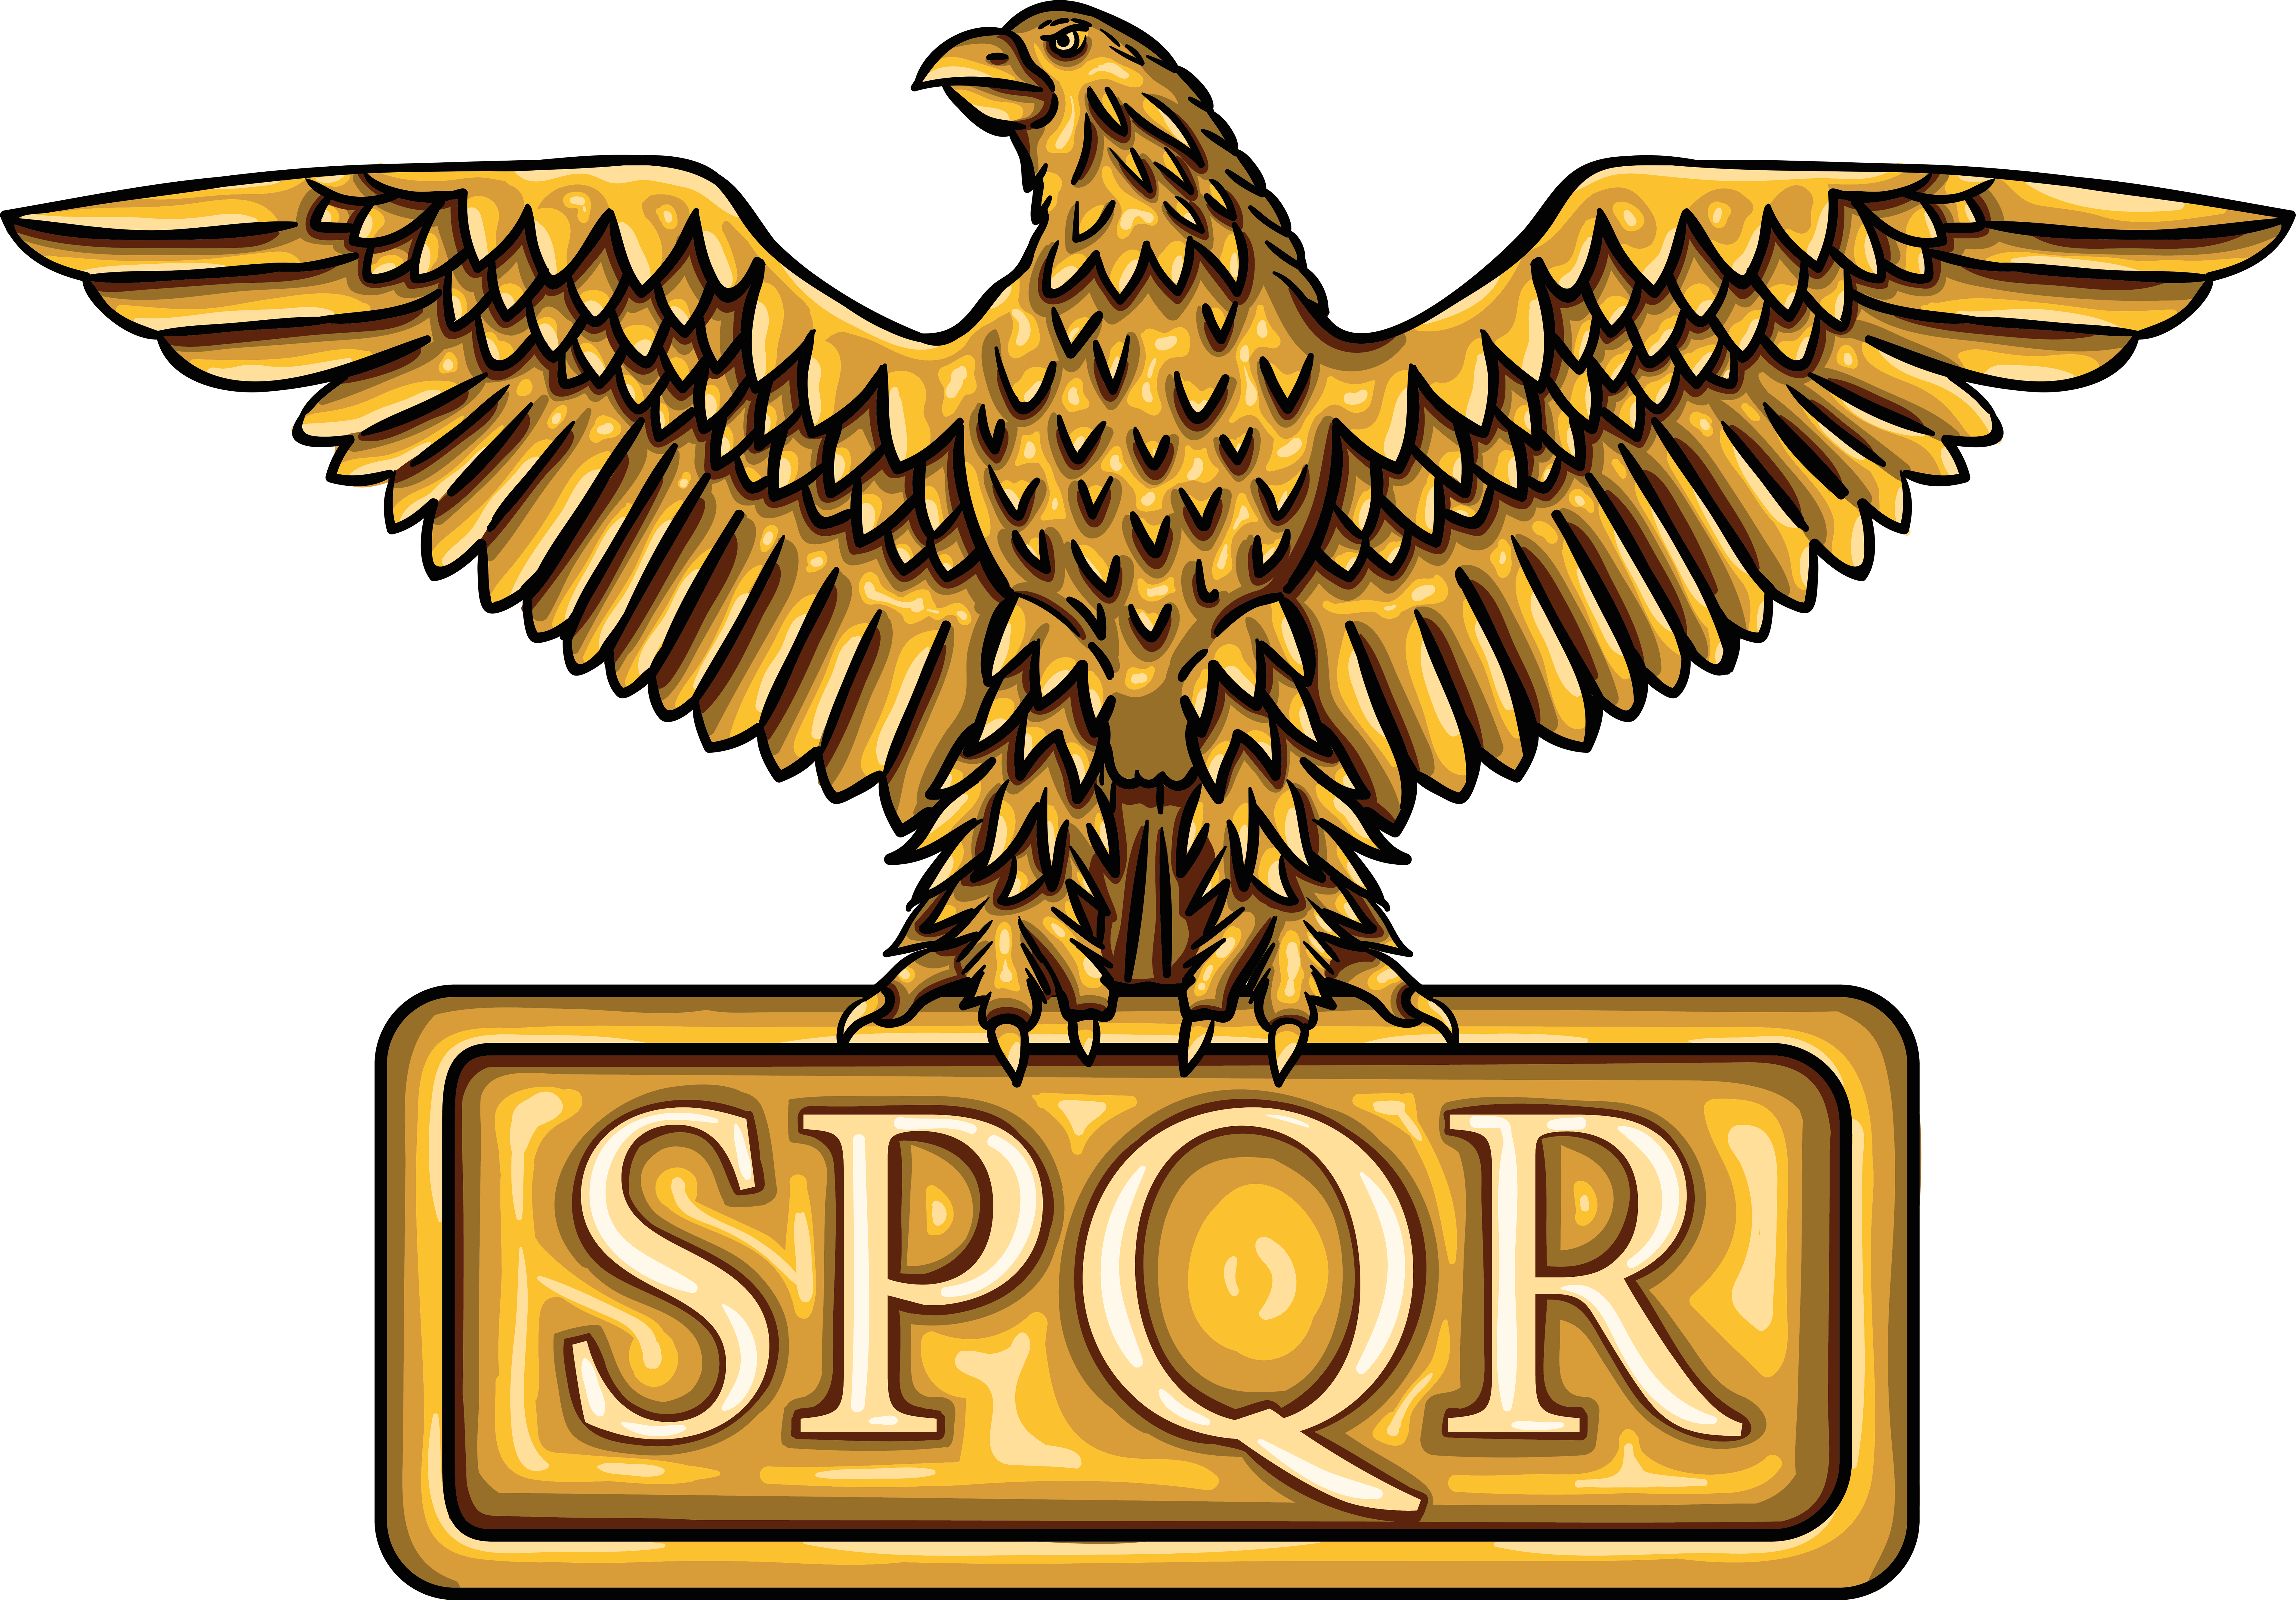 Golden Emblem Of Roman Empire Spqr Essential T Shirt By Lobro In 2021 Roman Empire Roman Roman Centurion